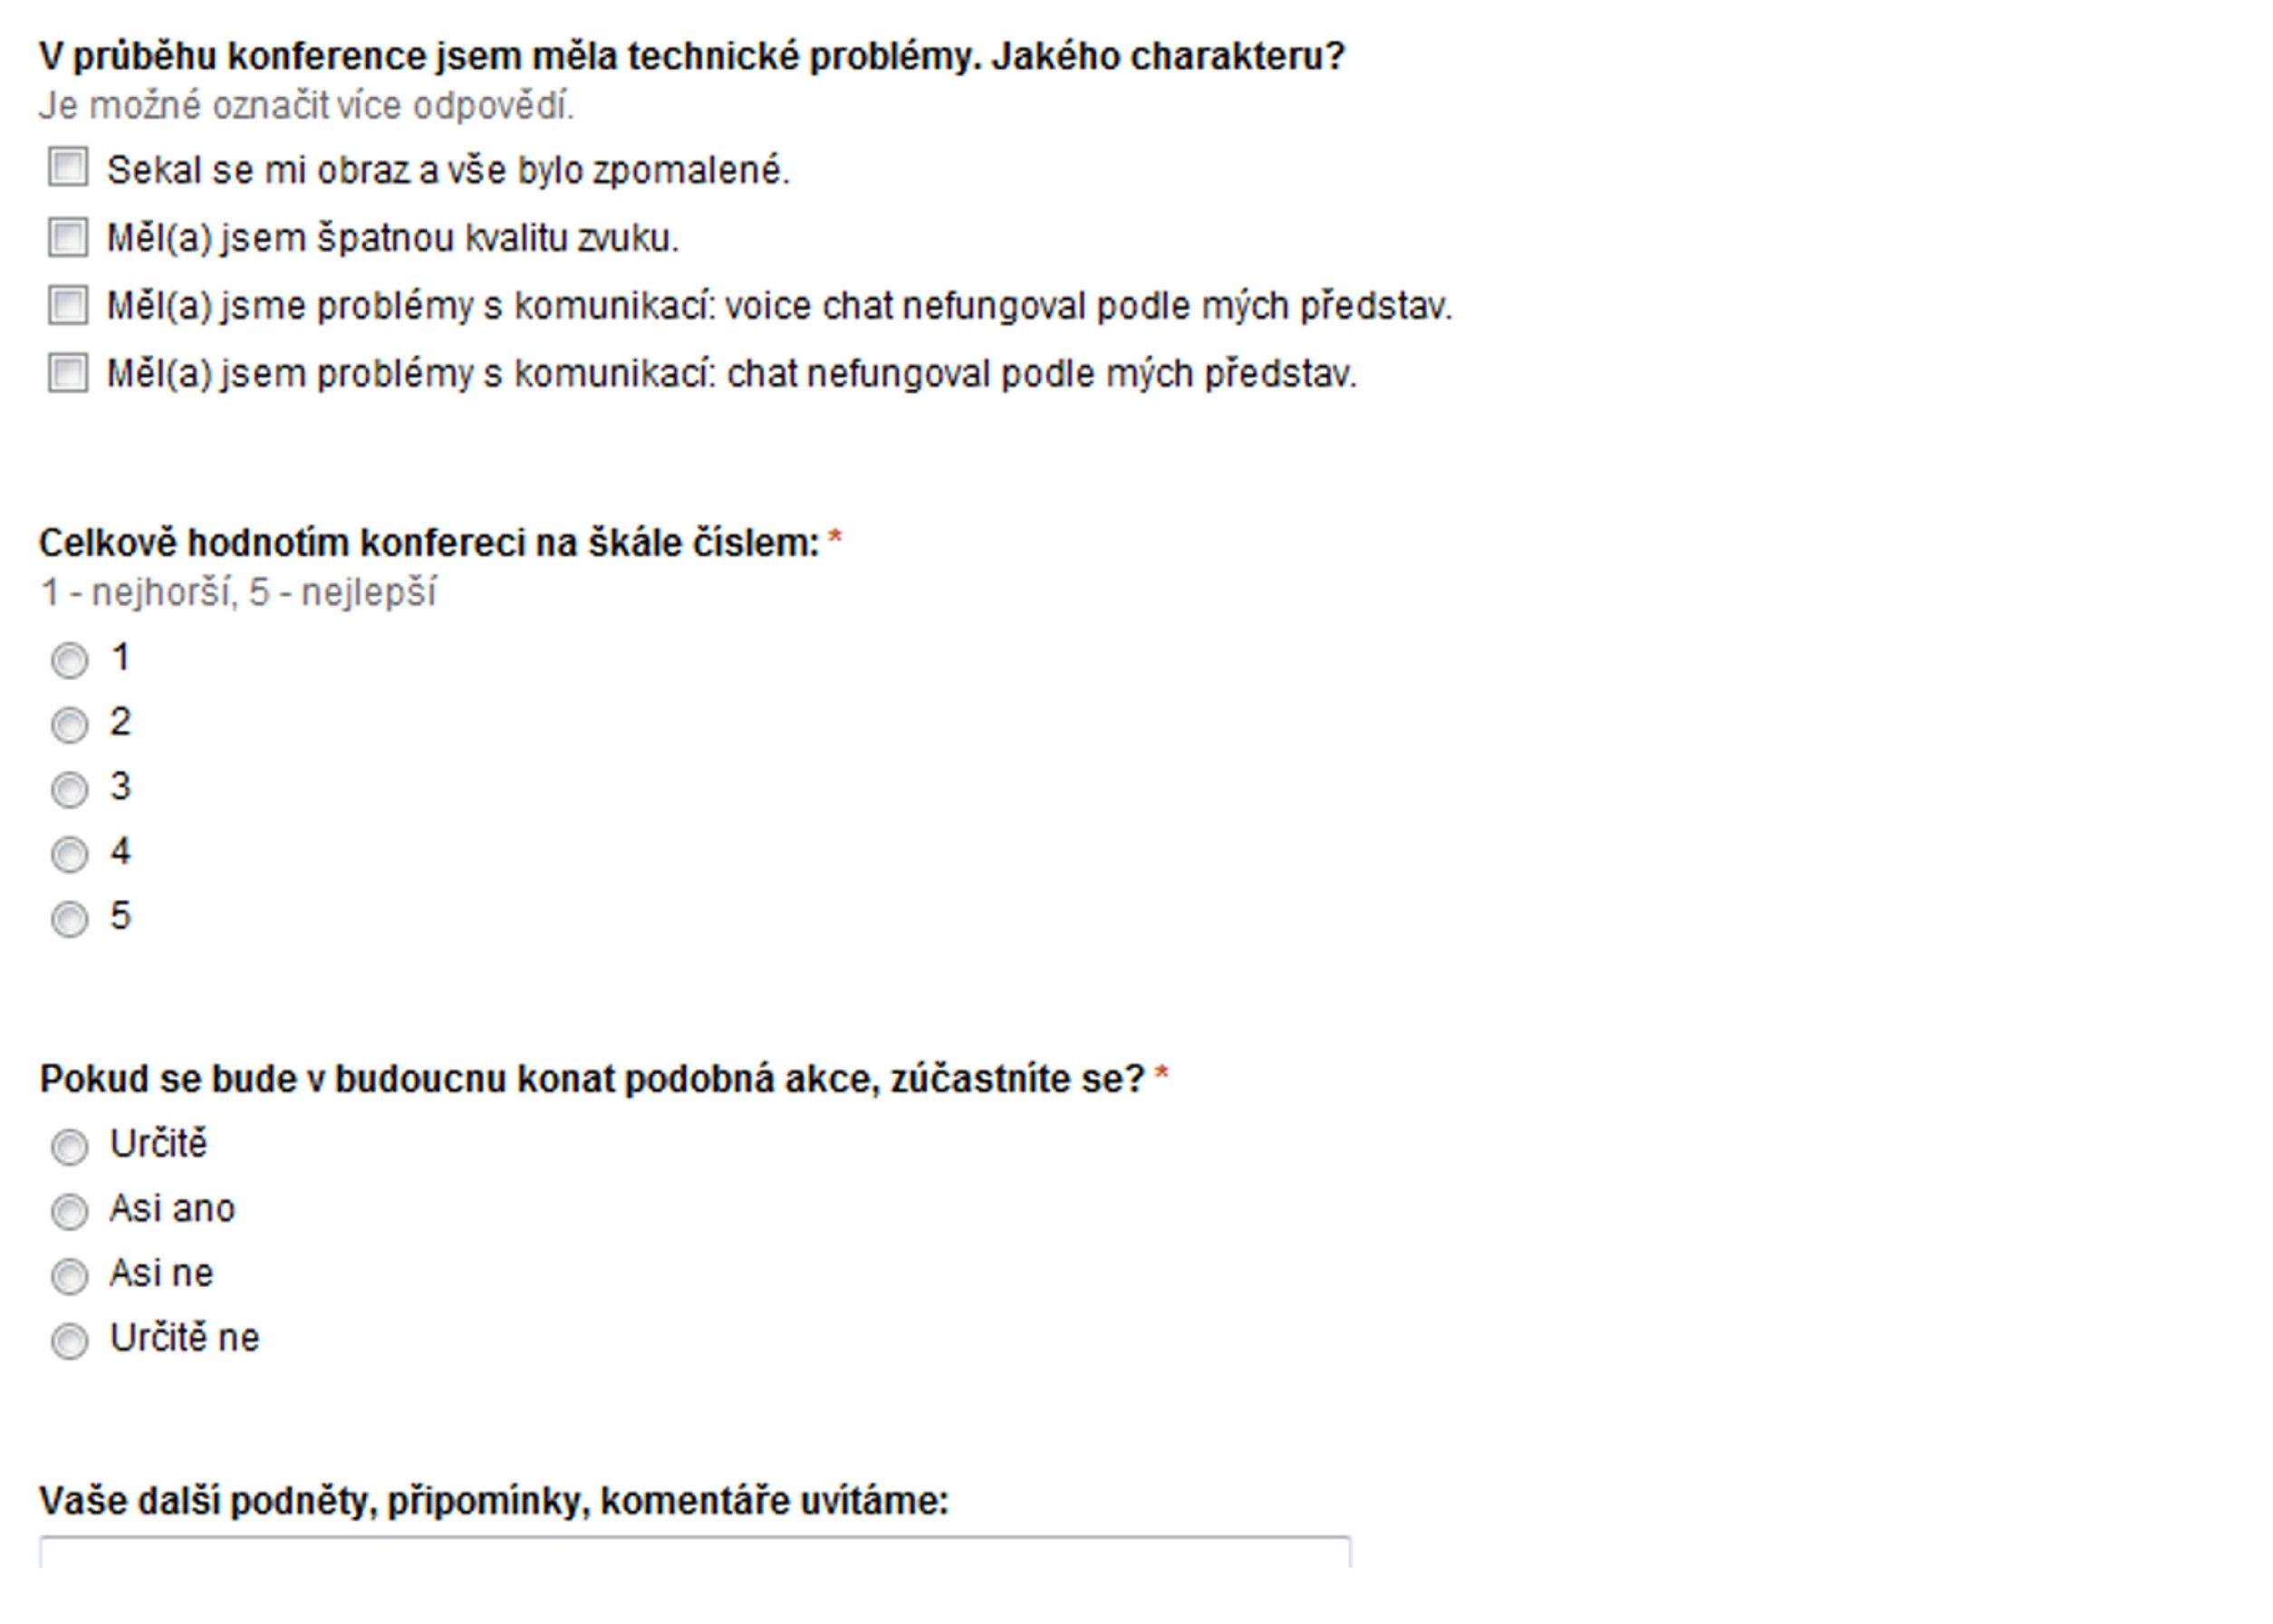 Industrial revolution dbq essay answers